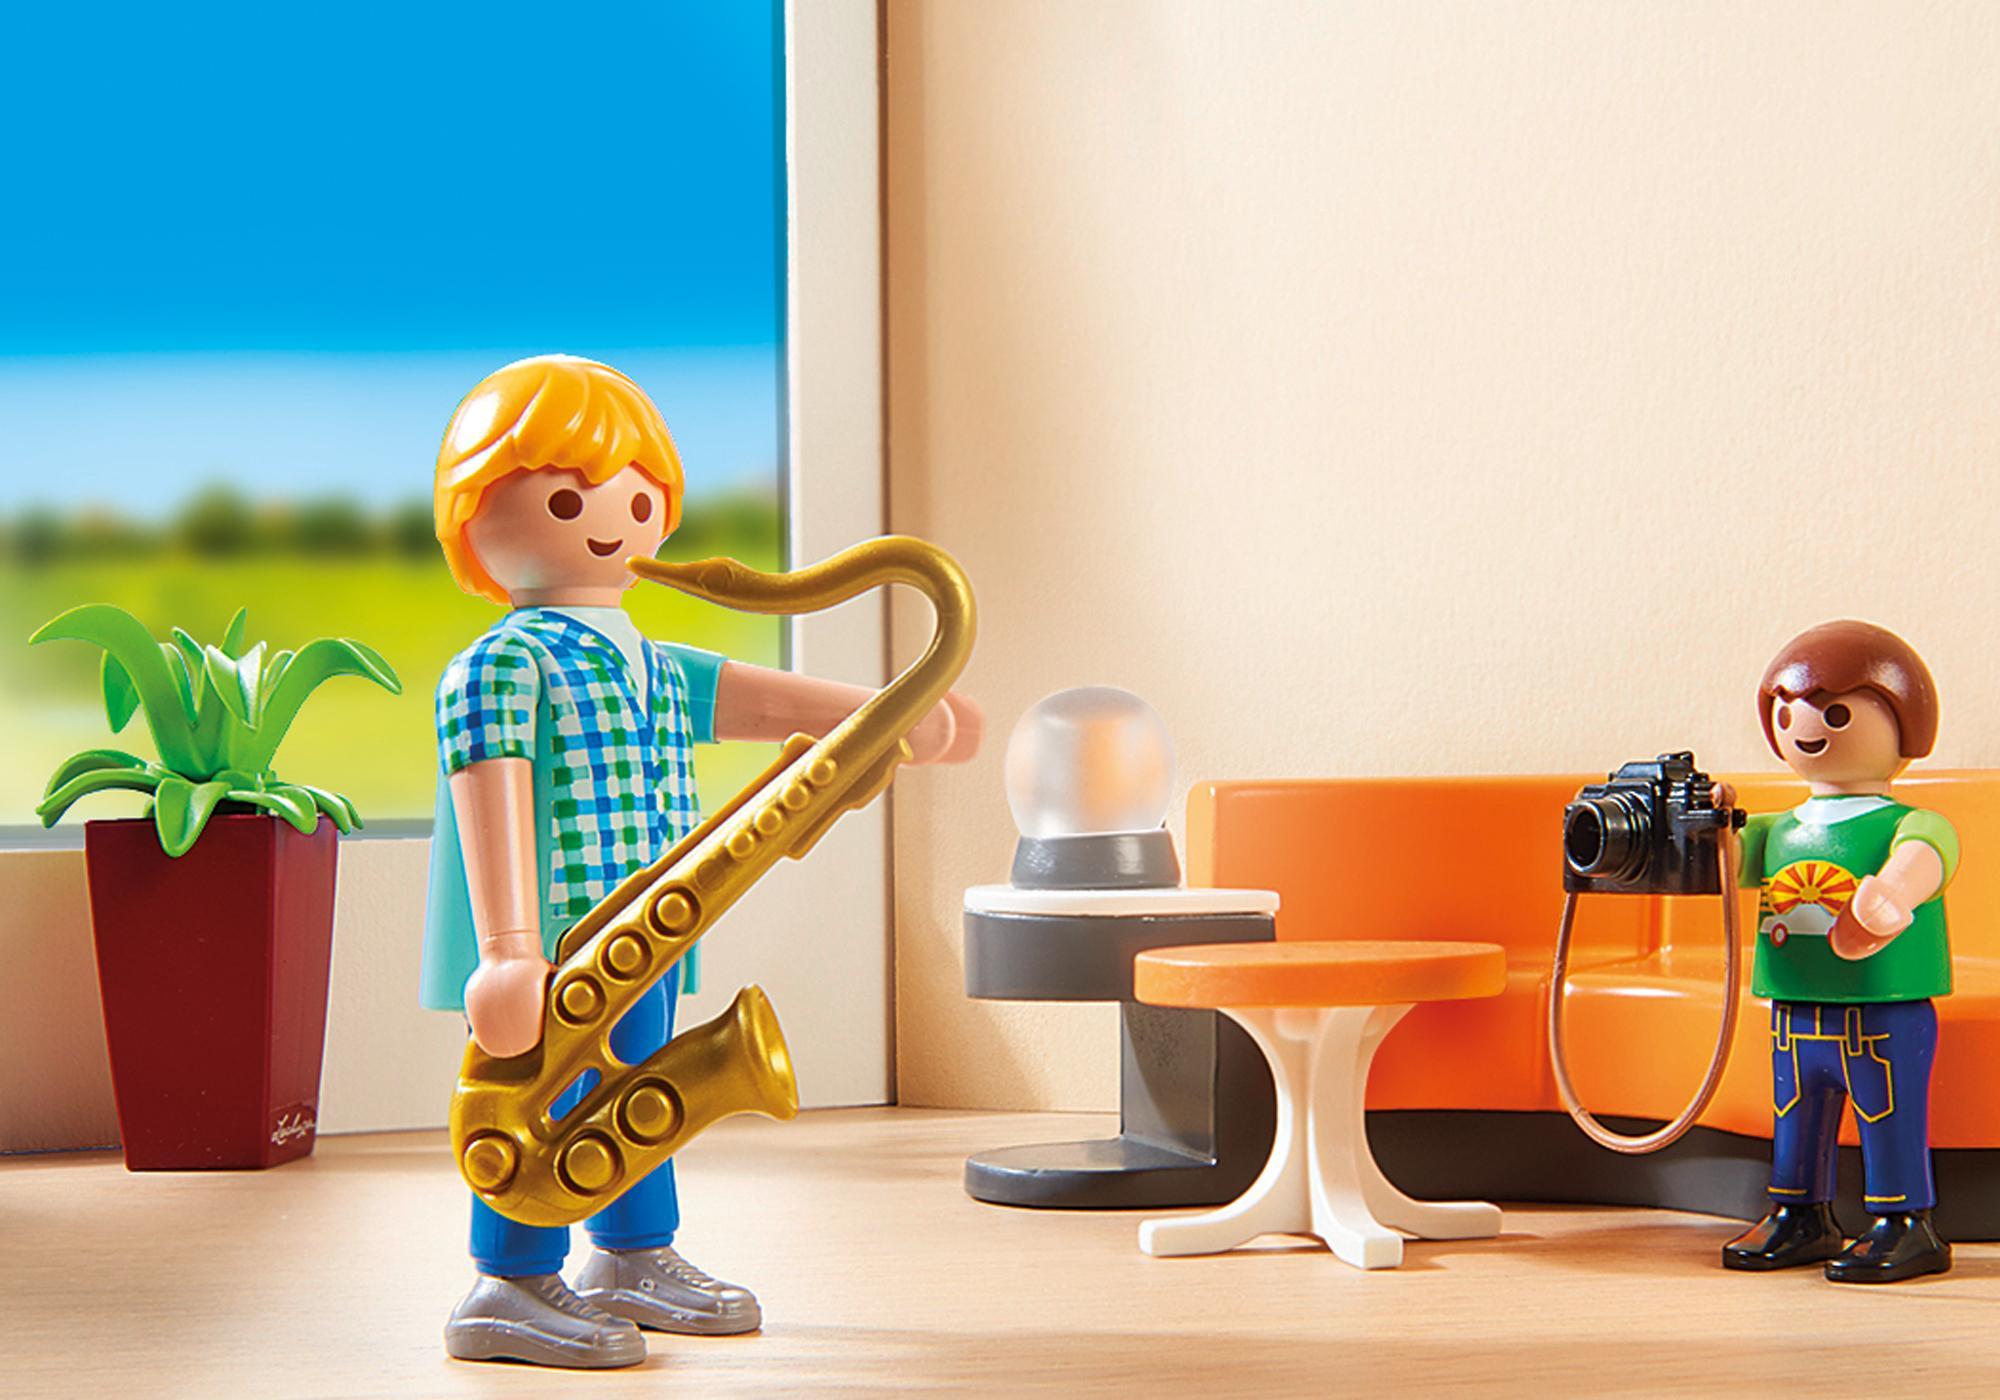 http://media.playmobil.com/i/playmobil/9267_product_extra1/Wohnzimmer